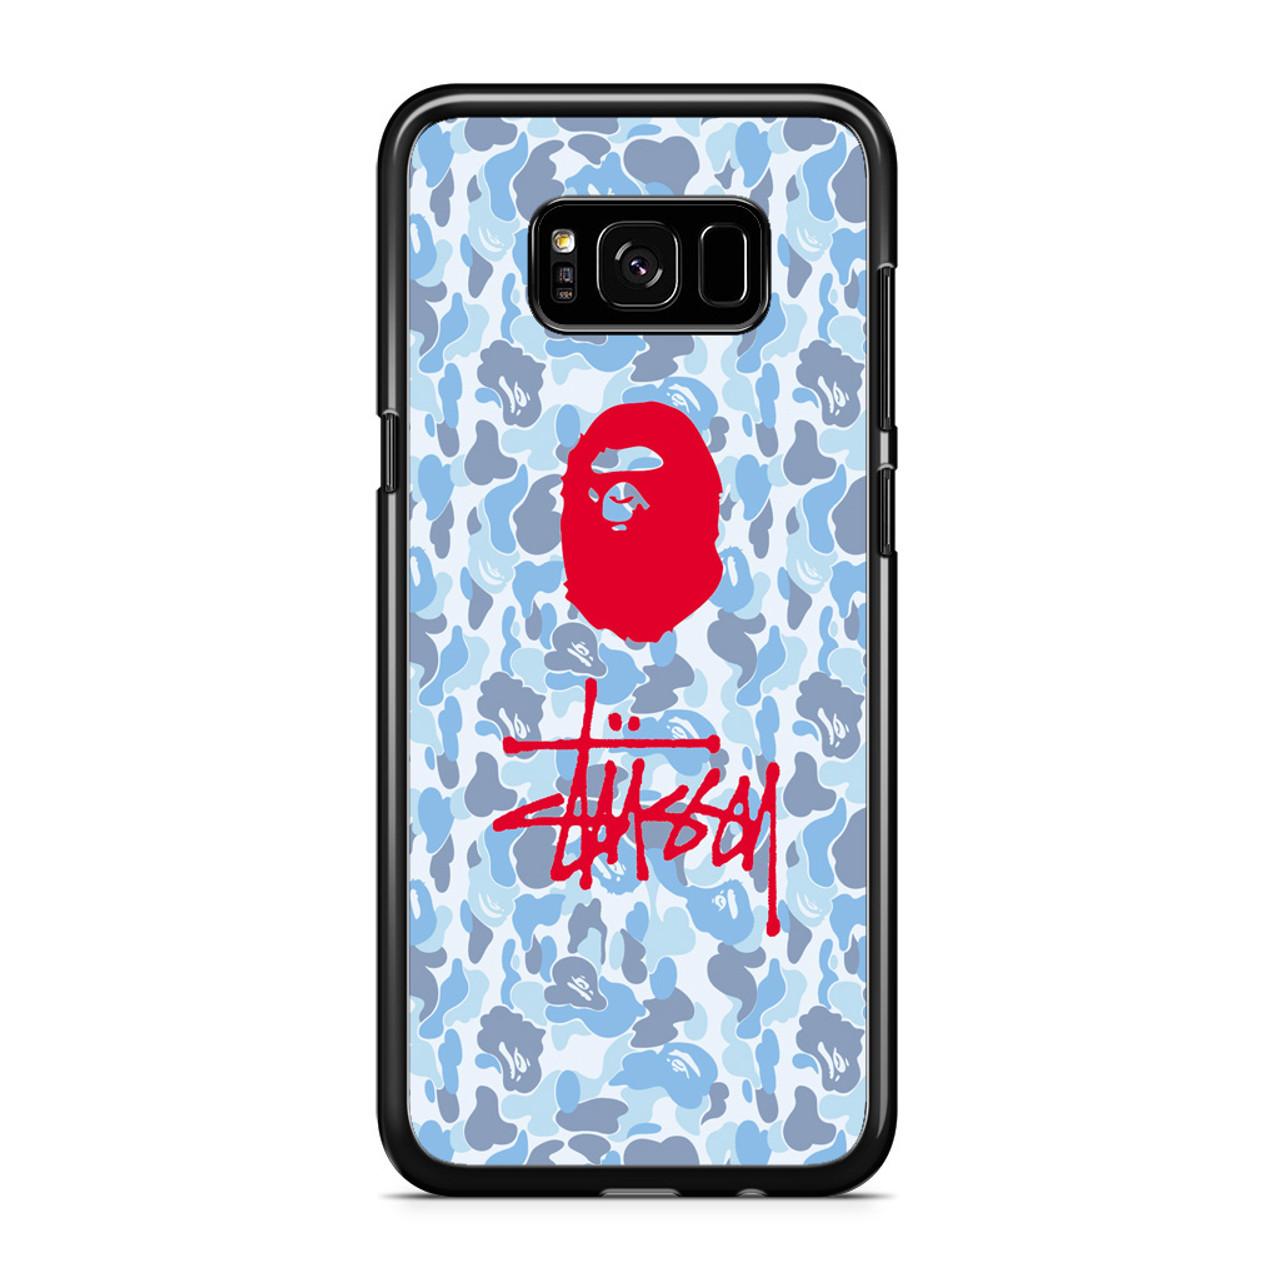 on sale 1b560 d9bd7 Bape X Stussy Samsung Galaxy S8 Plus Case